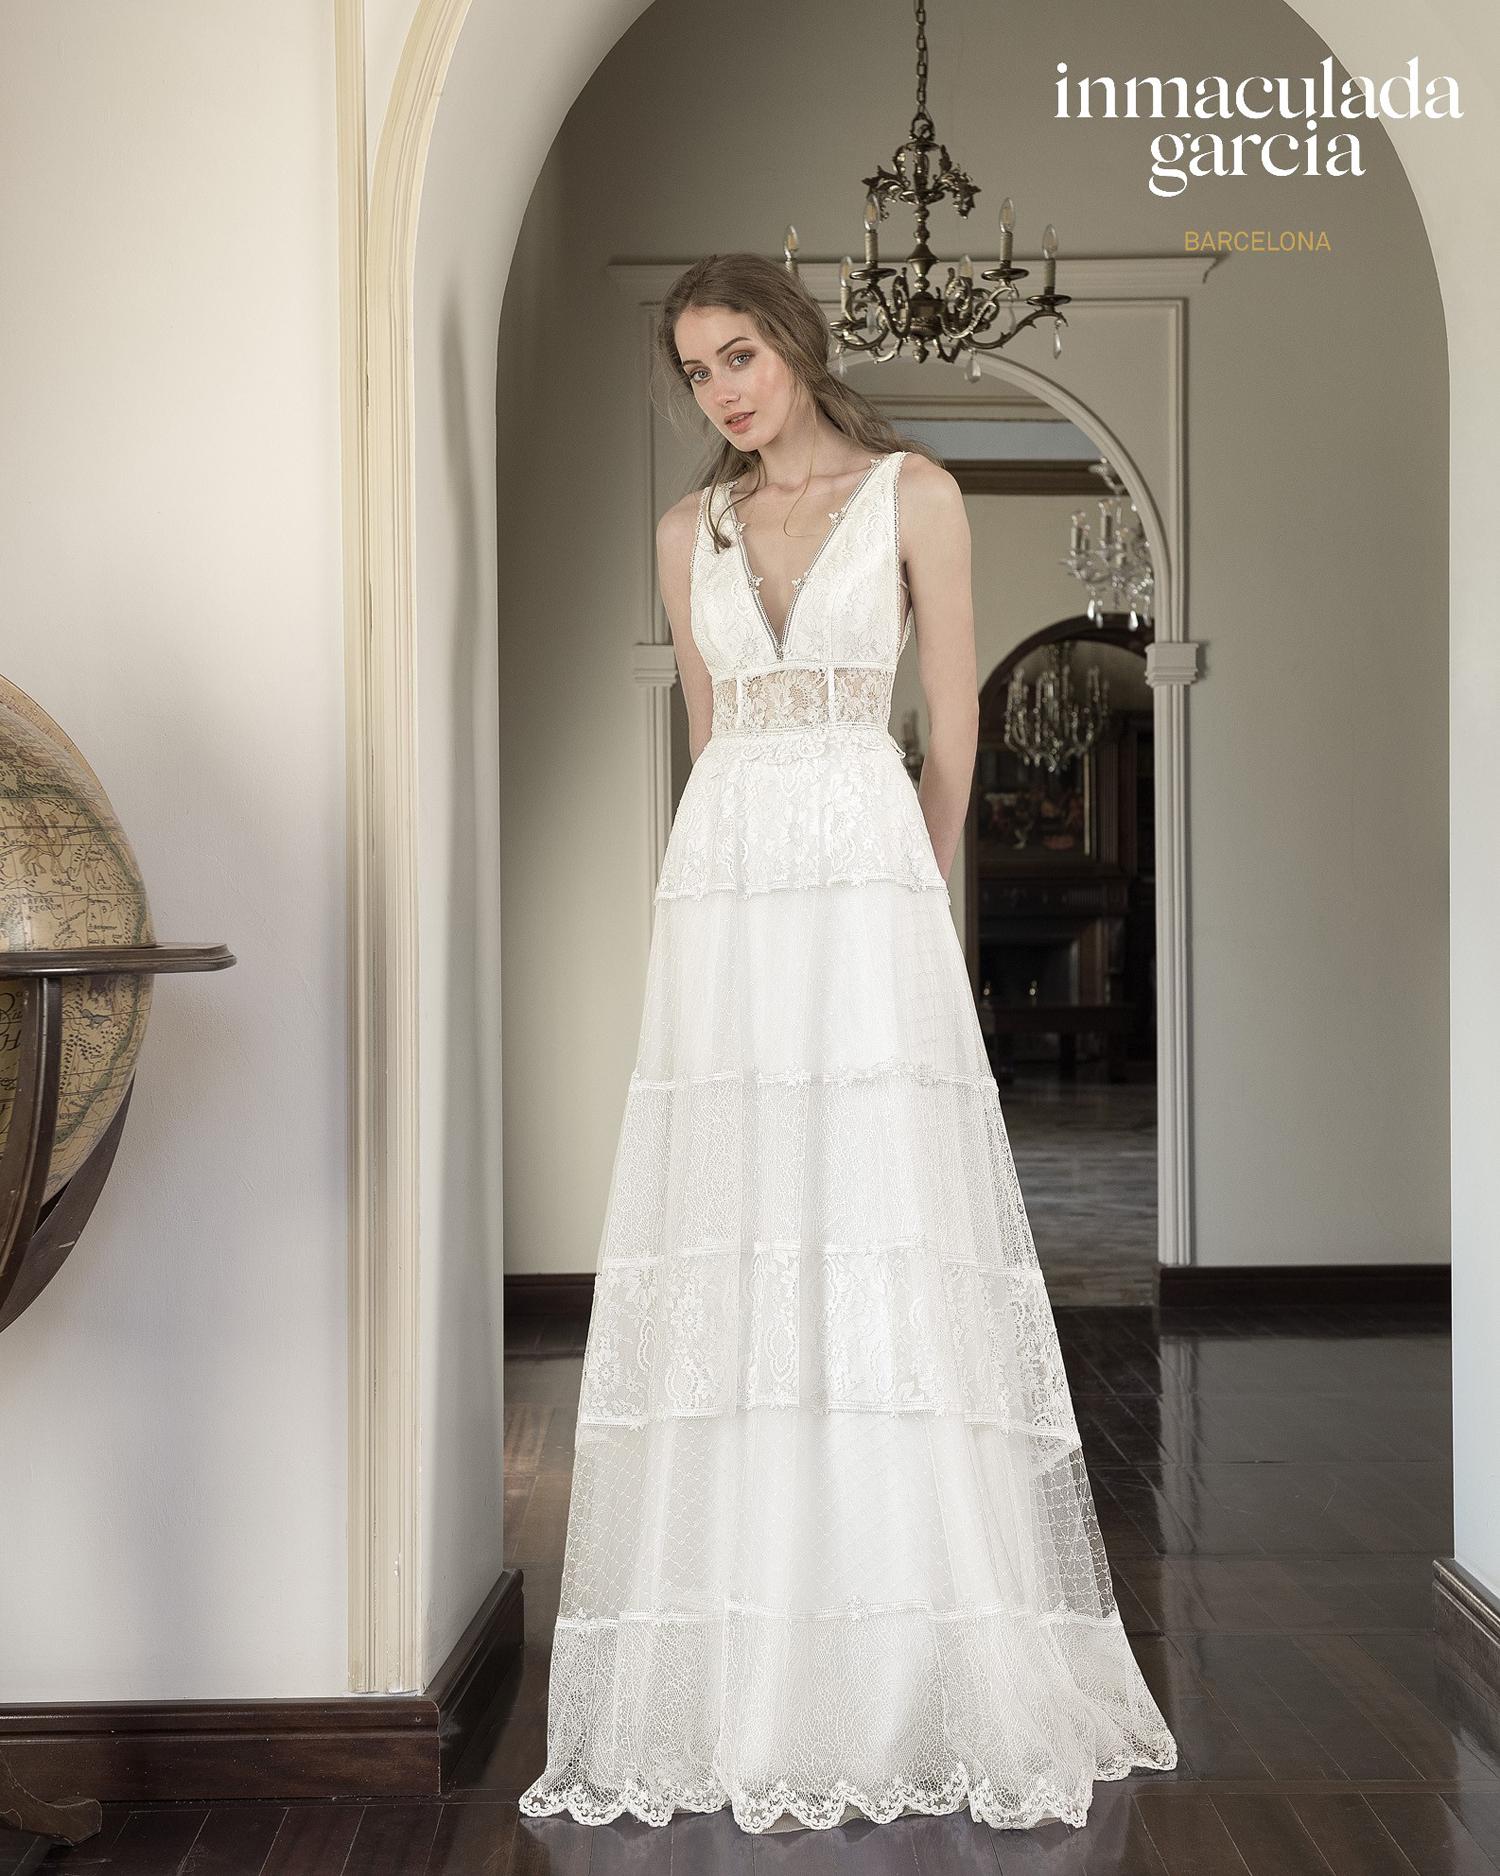 Vestiti Cerimonia Vicenza.Abito Da Sposa Immaculada Garcia 2020 Laguna Mariages It